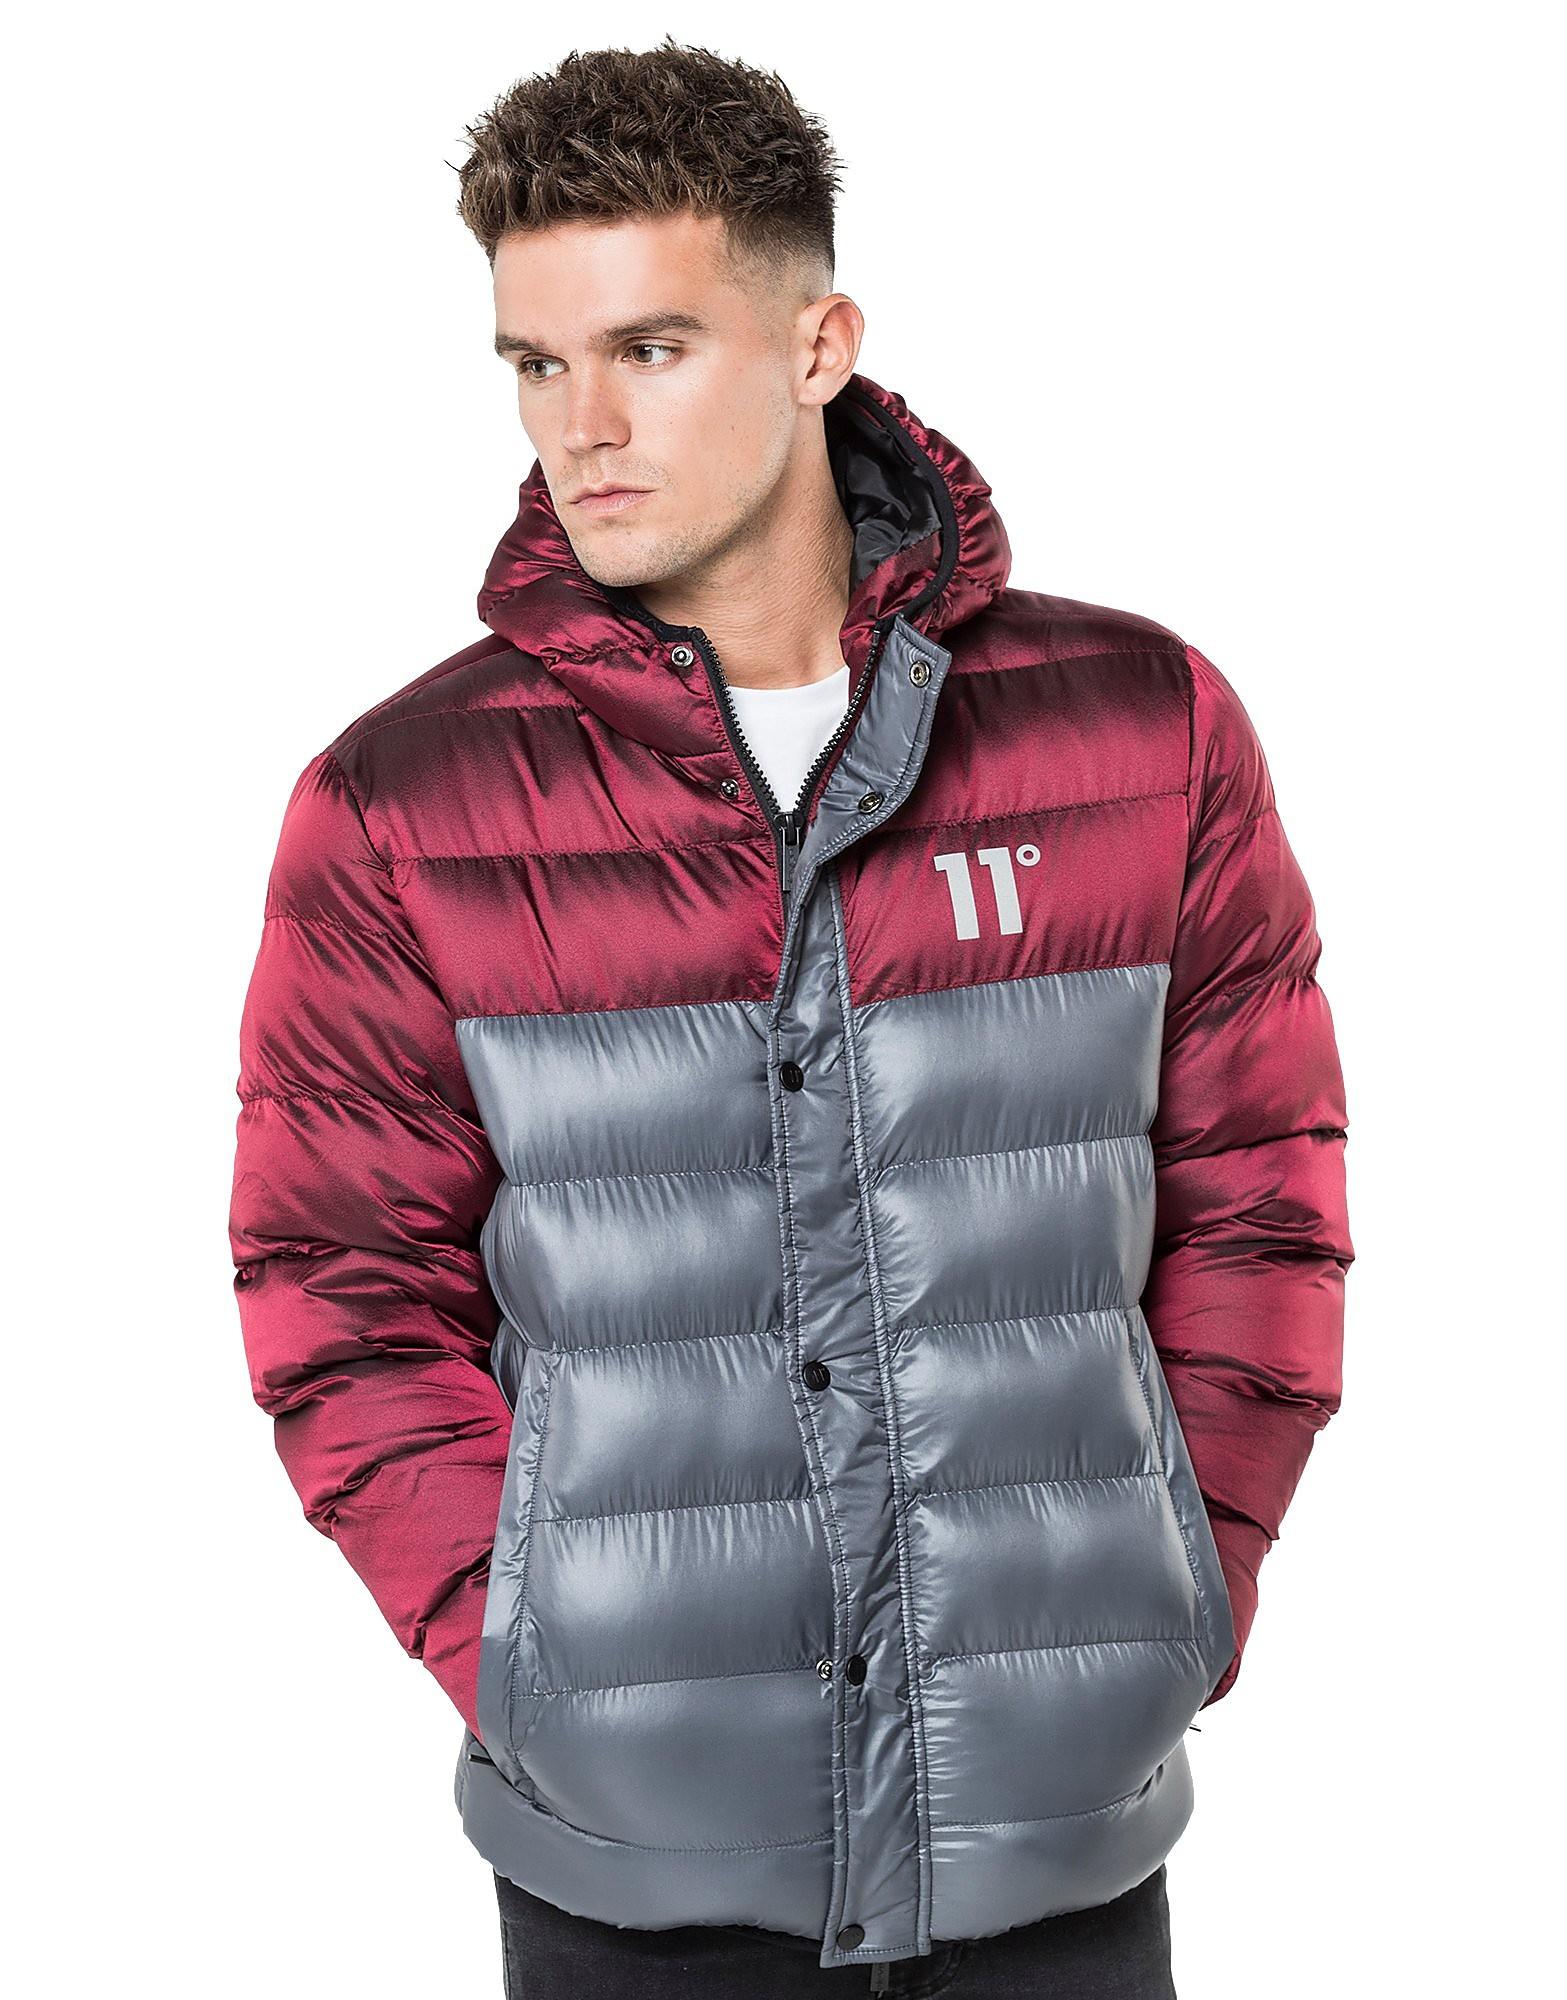 11 Degrees Strike Jacket